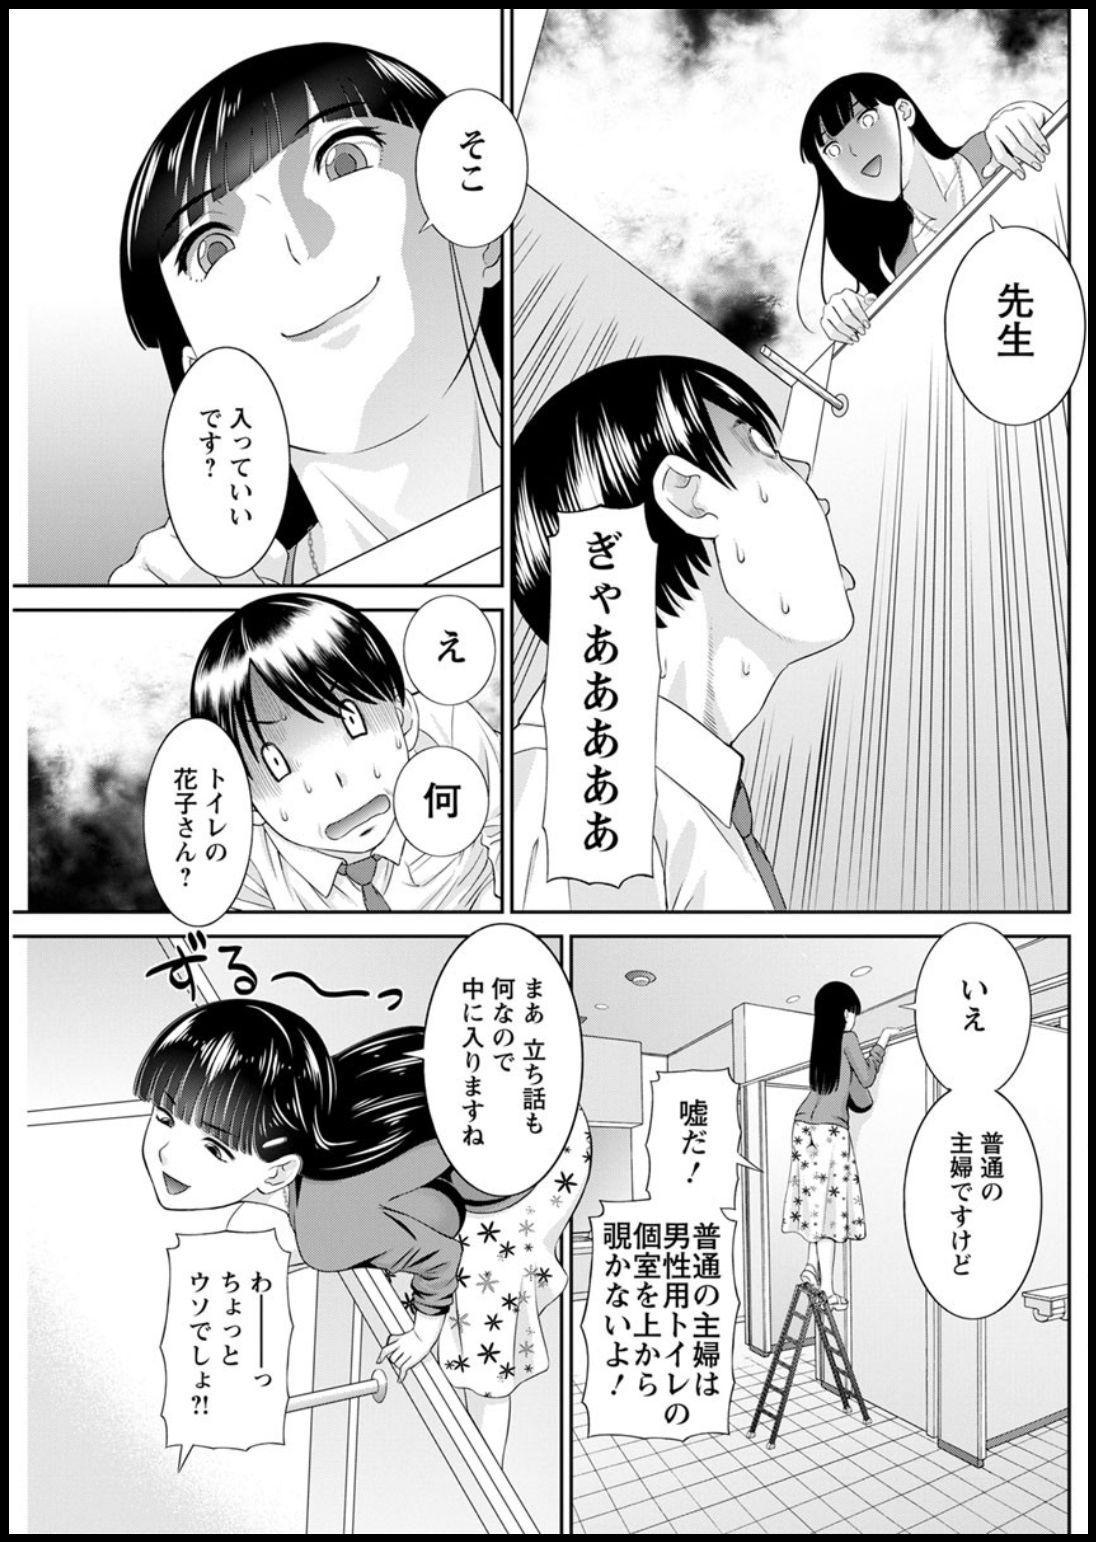 [Kawamori Misaki] Kaikan Hitotsuma Gakuen Ch. 1-6, 8-16 [Digital] 174